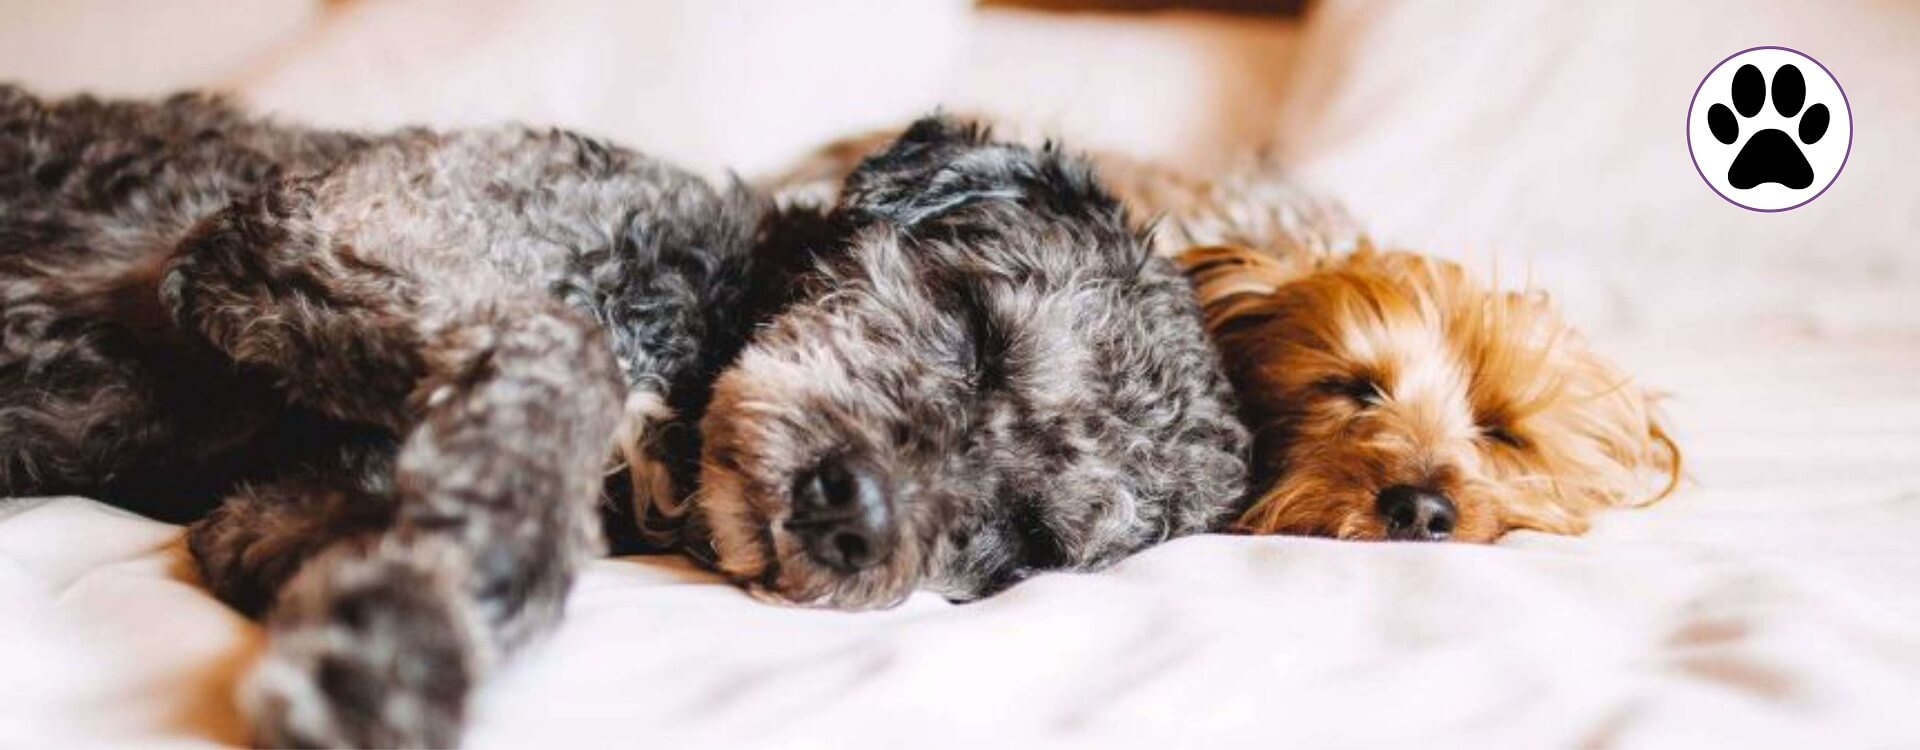 Pet-friendly-serviced-apartments-london (1)